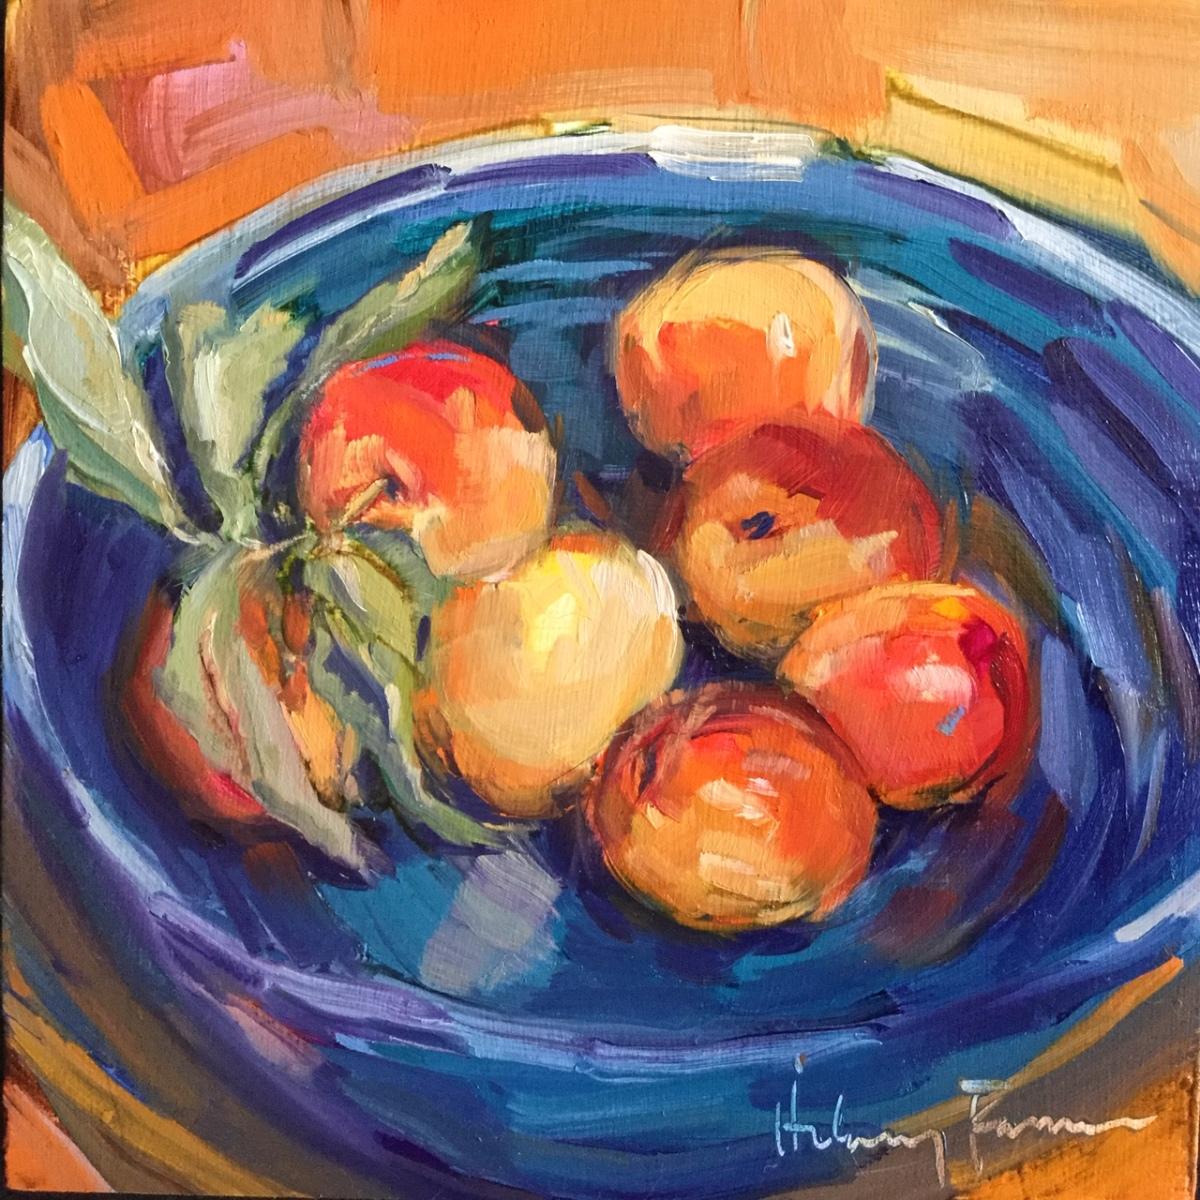 20190708-peach-plums